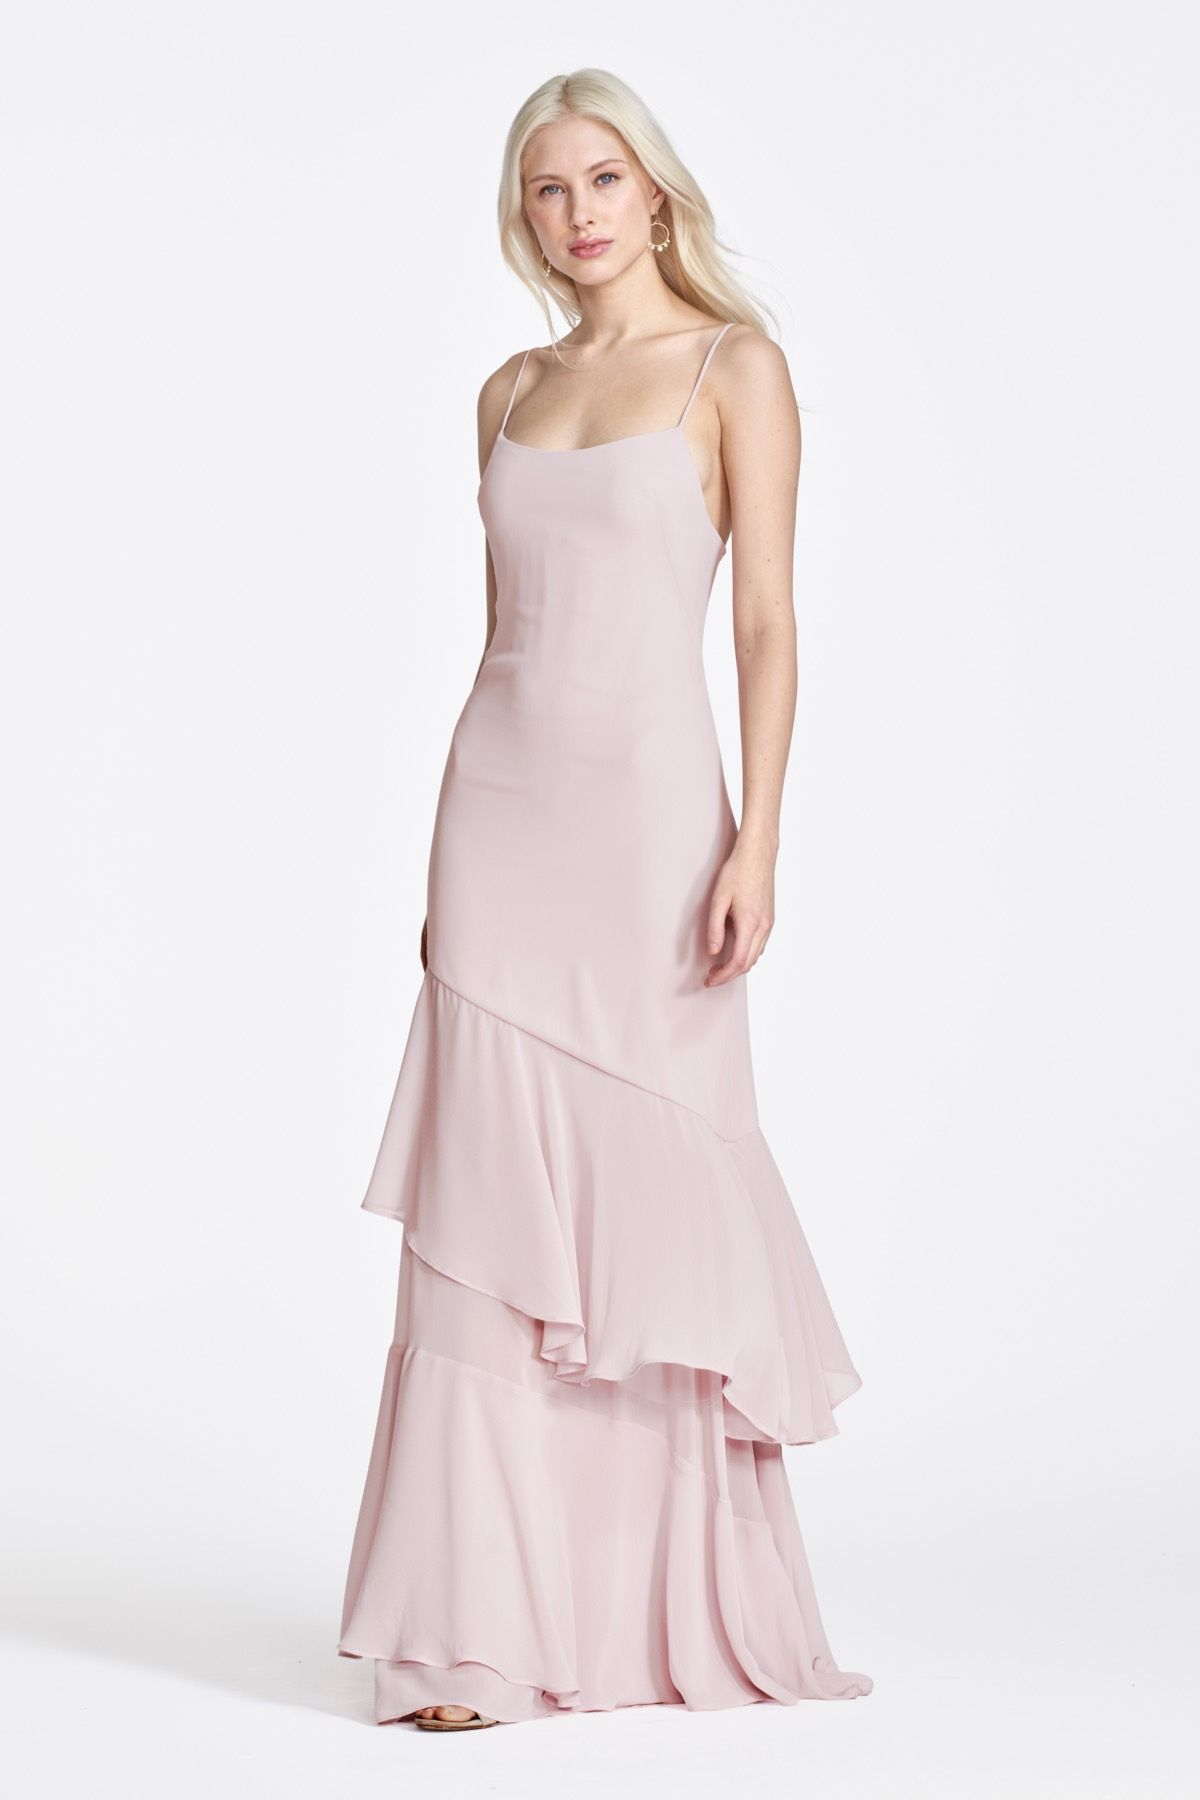 https://www.bridalreflections.com/wp-content/uploads/2020/03/8502_burnished_lilac_01.jpg